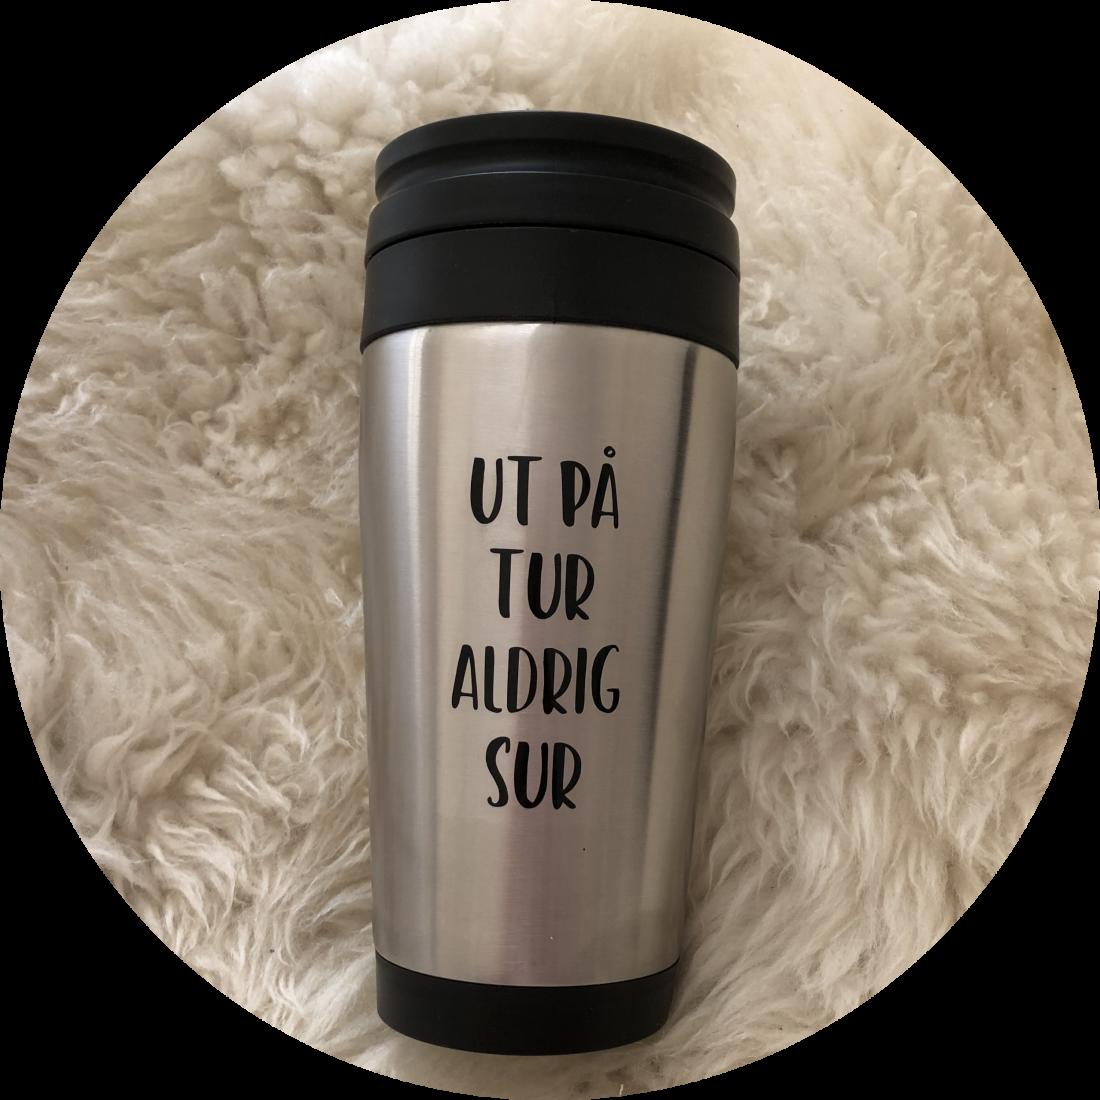 termosmugg, kaffemugg, termos, mugg, kaffe, tryck, vinyl, dekal, citat, ruff & stuff, ruff o stuff, ruffostuff, fri frakt, fraktfritt